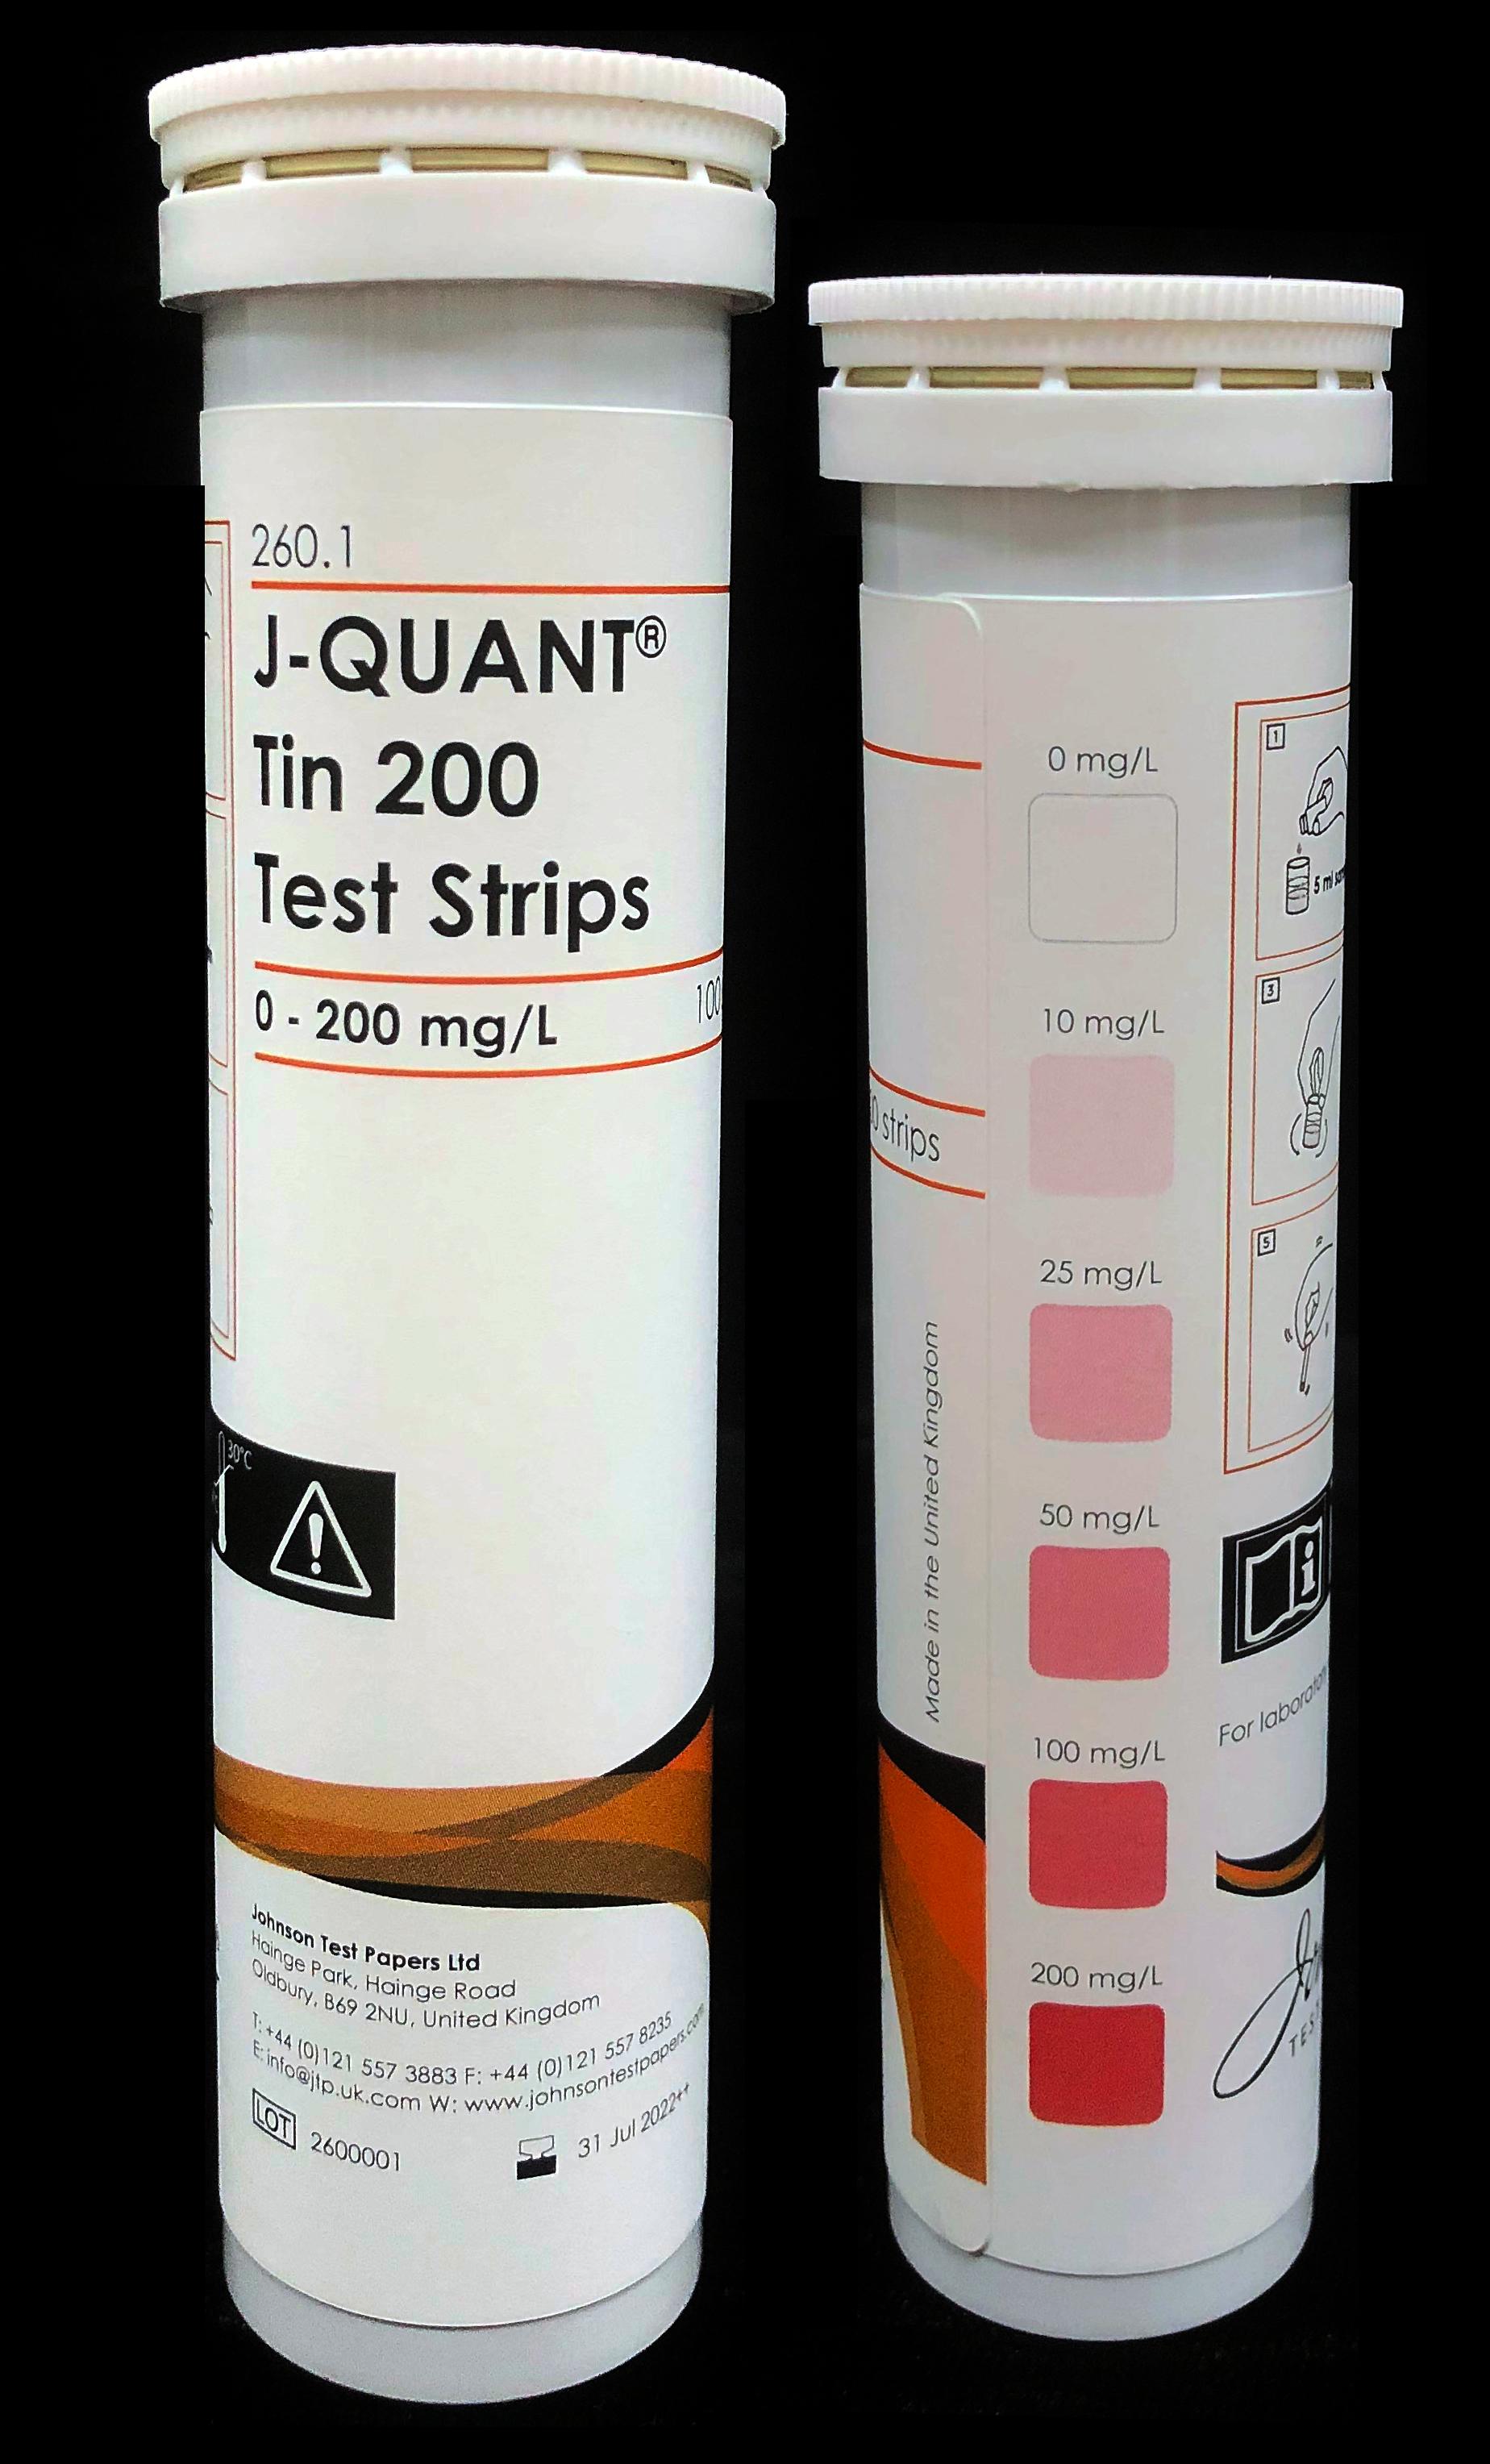 J-QUANT<sup>®</sup> Tin